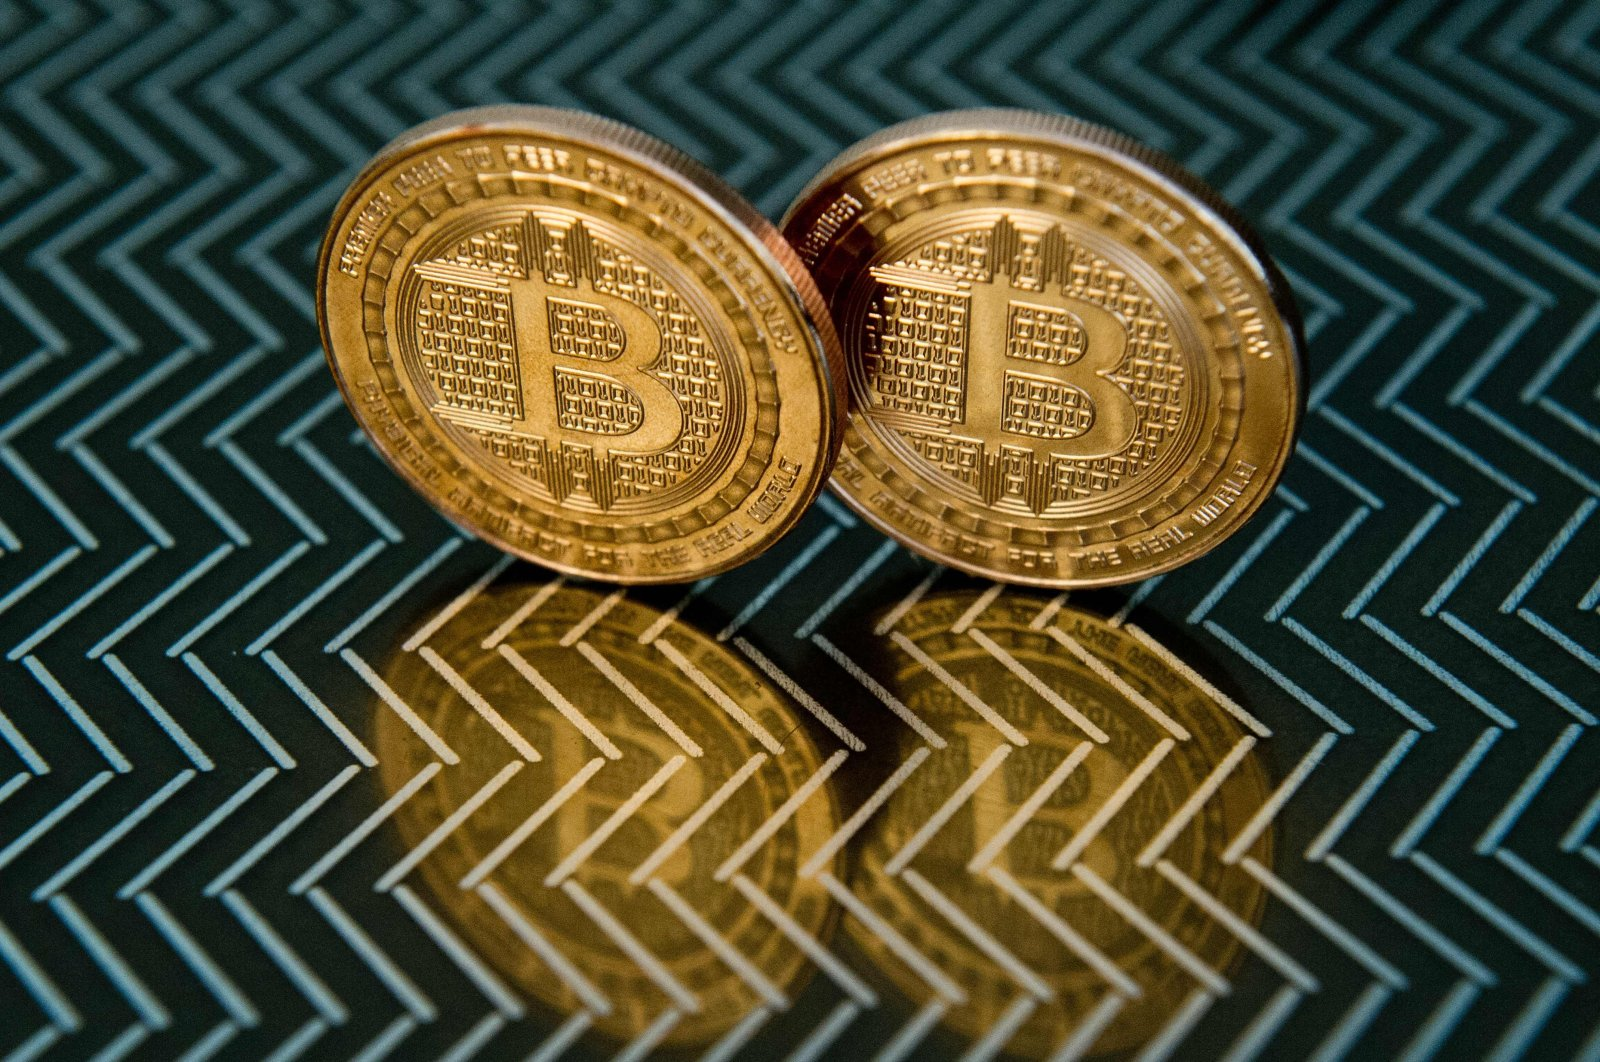 Bitcoin medals seen in Washington, D.C., the U.S., June 17, 2014. (AFP Photo)